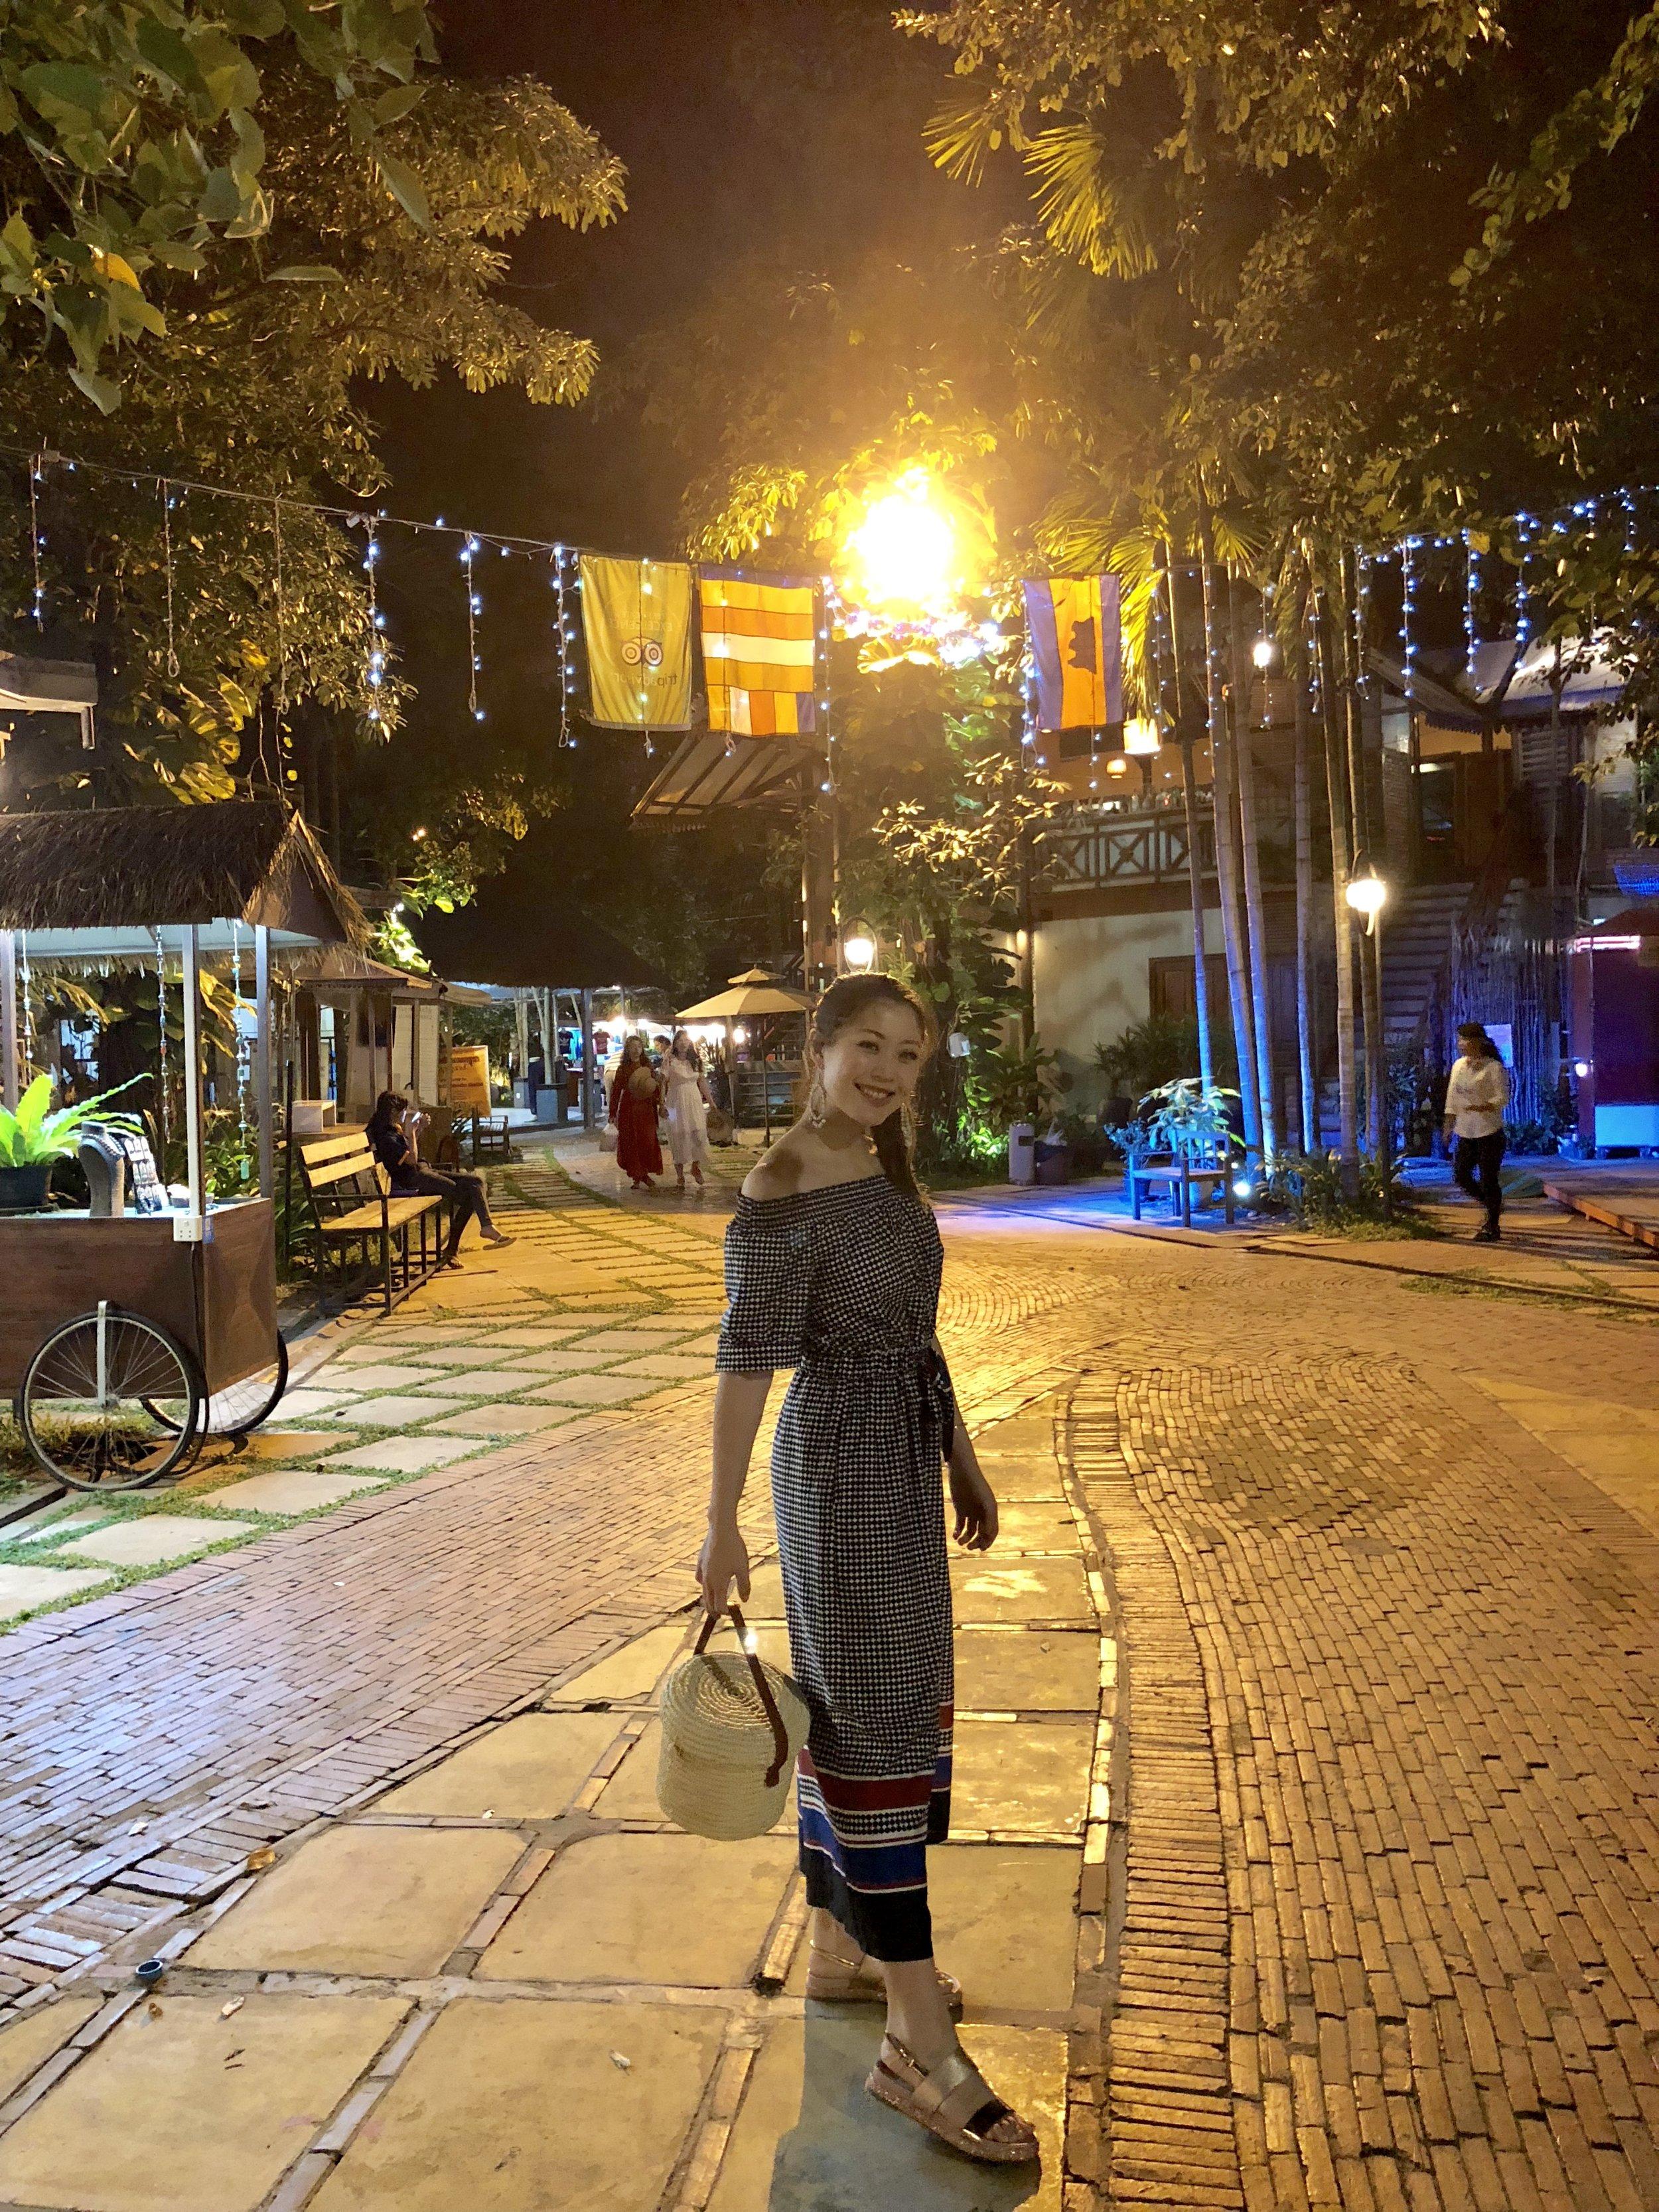 Heelsonthego Cambodia travel Siem Reap night market pub street